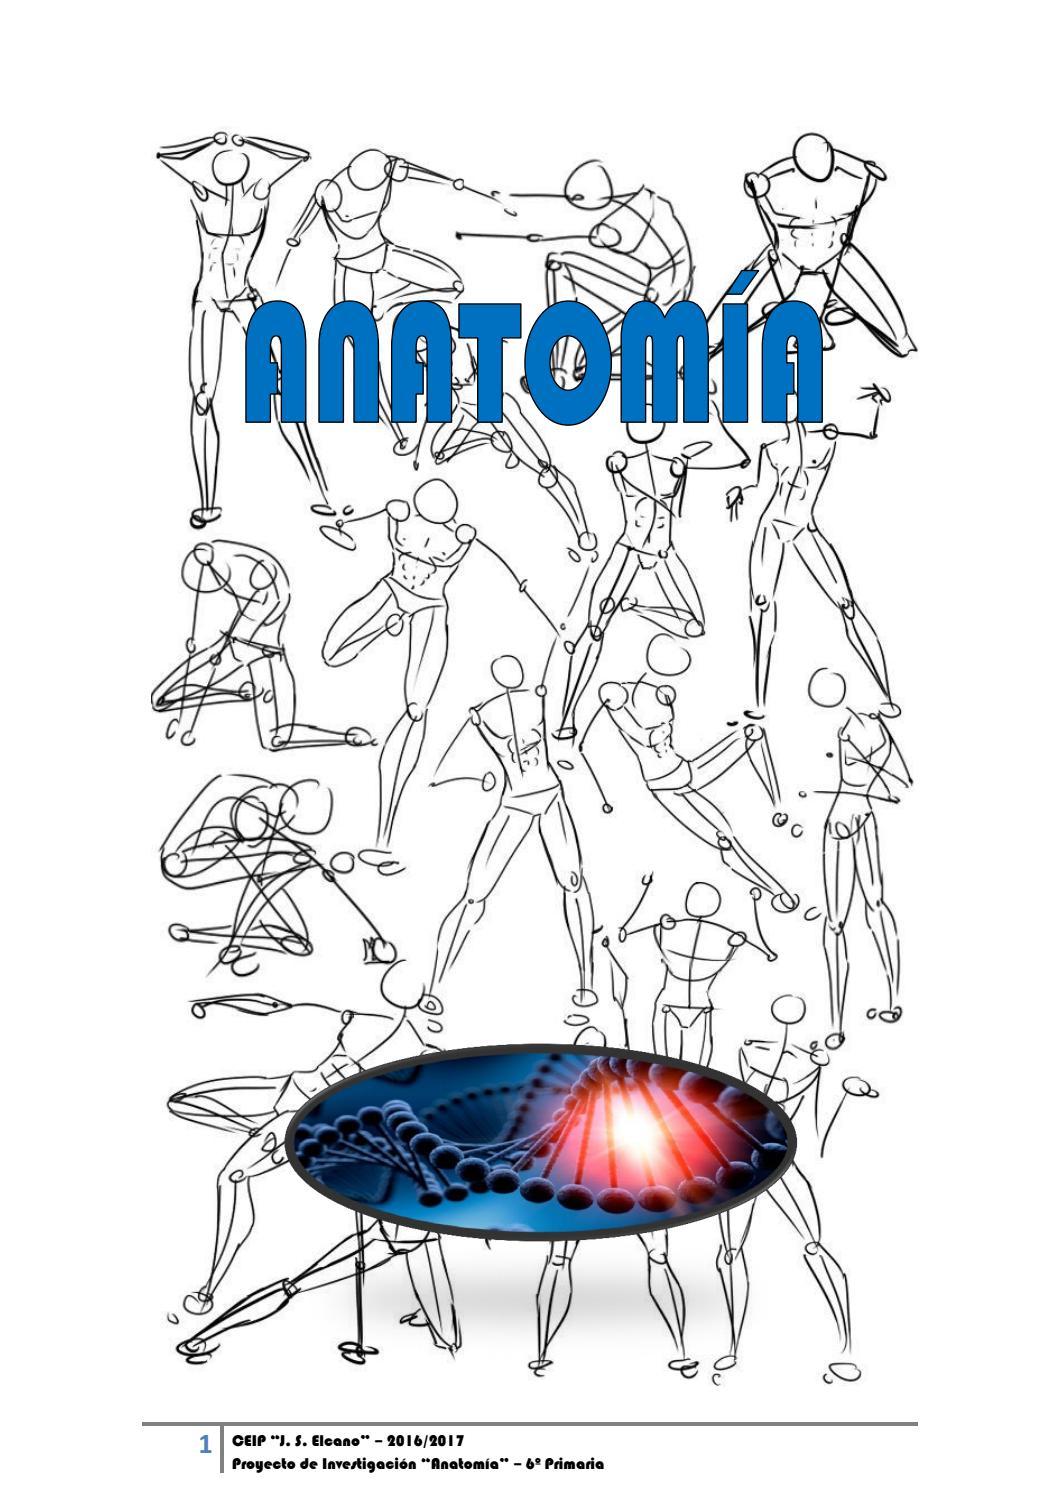 Dossier completo anatomía 16 17 by ELKANO - issuu